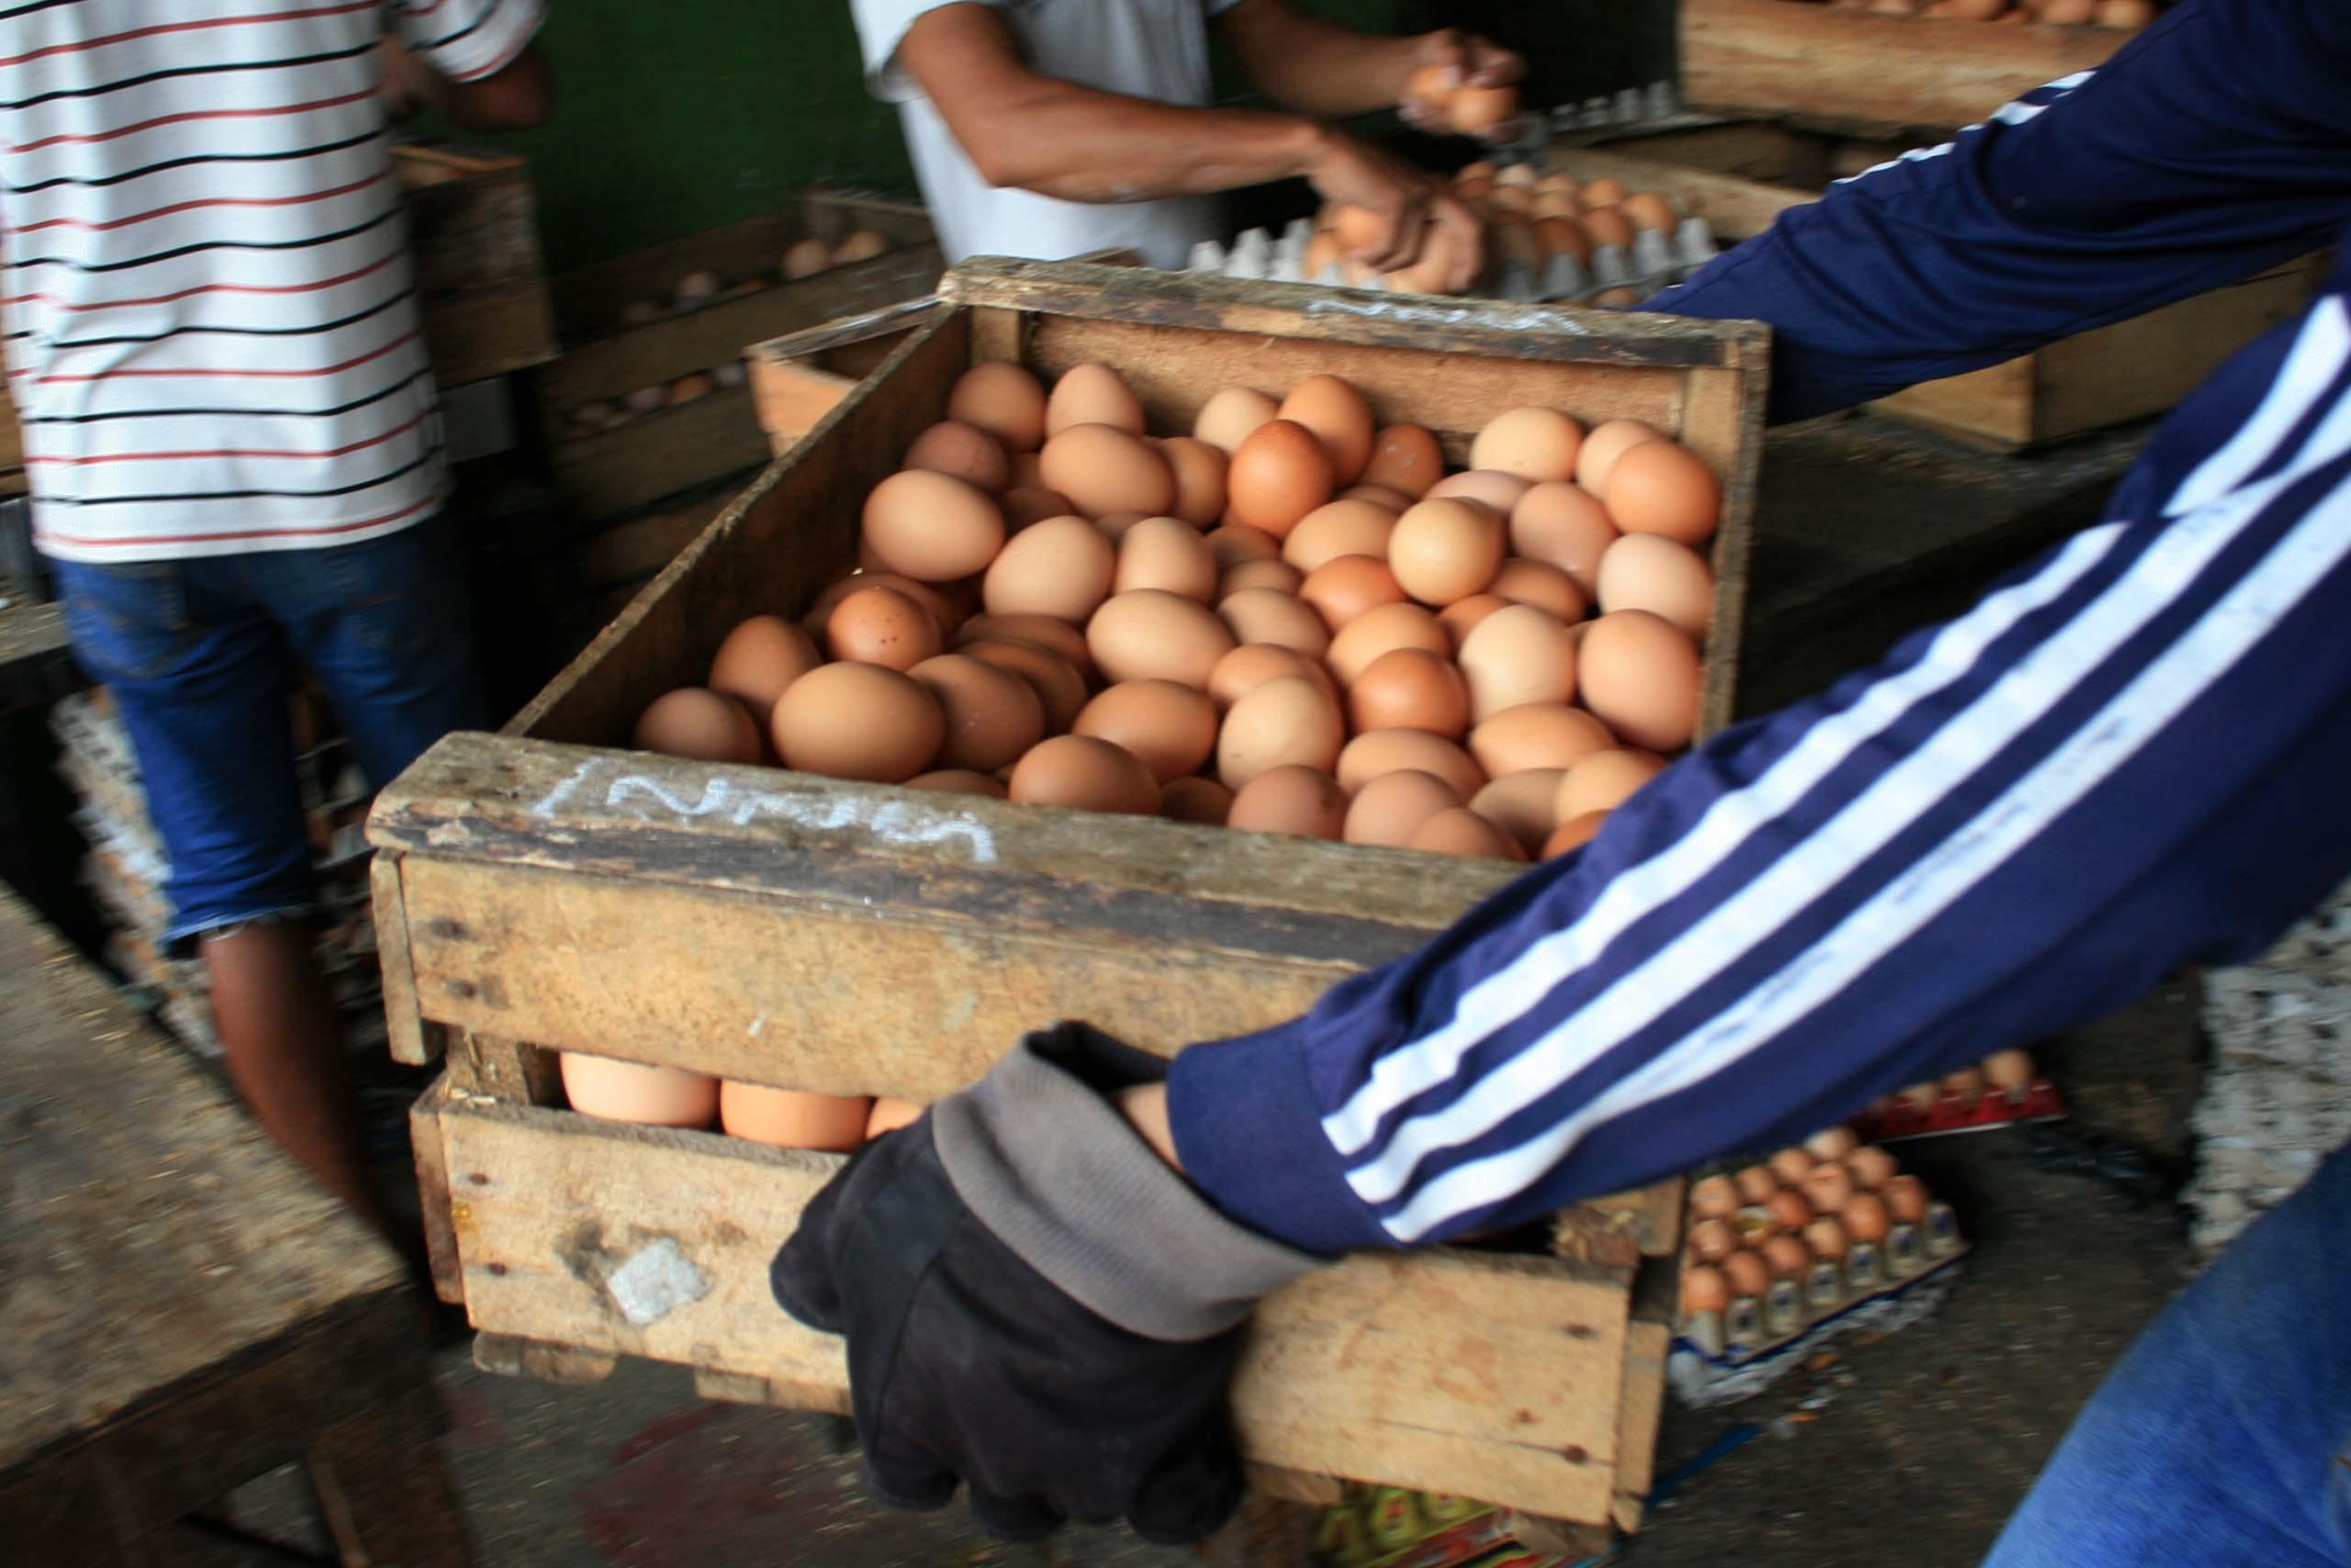 Kenaikan Harga Telur Ayam karena Turunnya Produktivitas